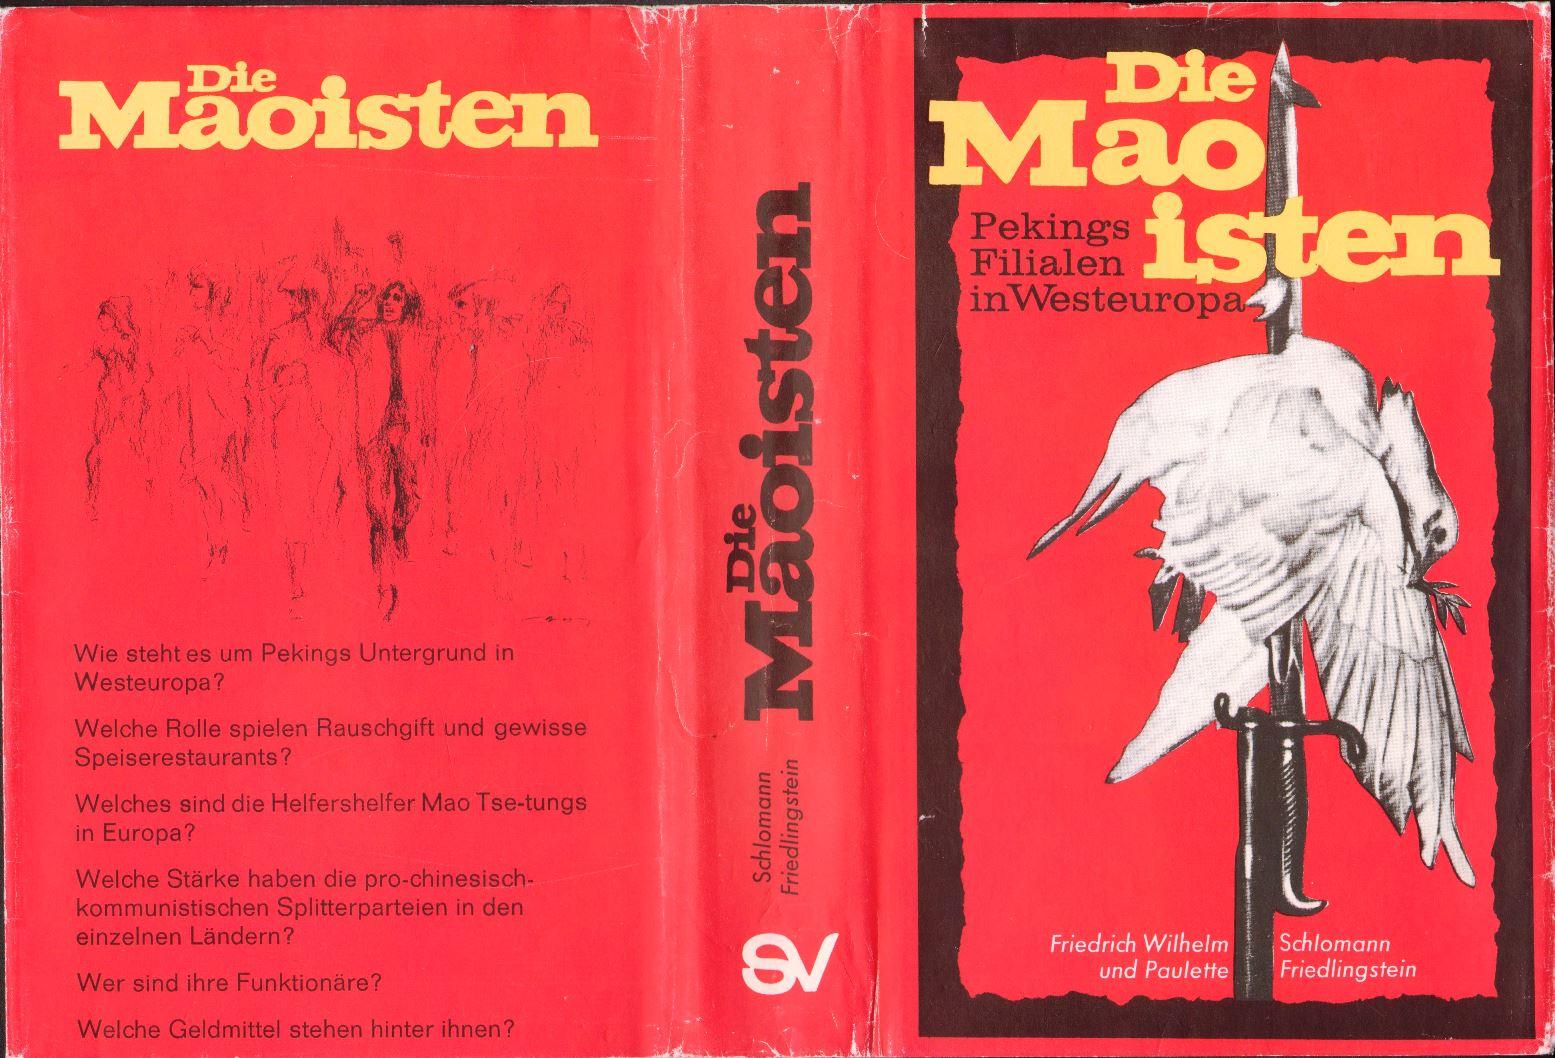 Schlomann_Friedlingstein_Die_Maoisten_0001